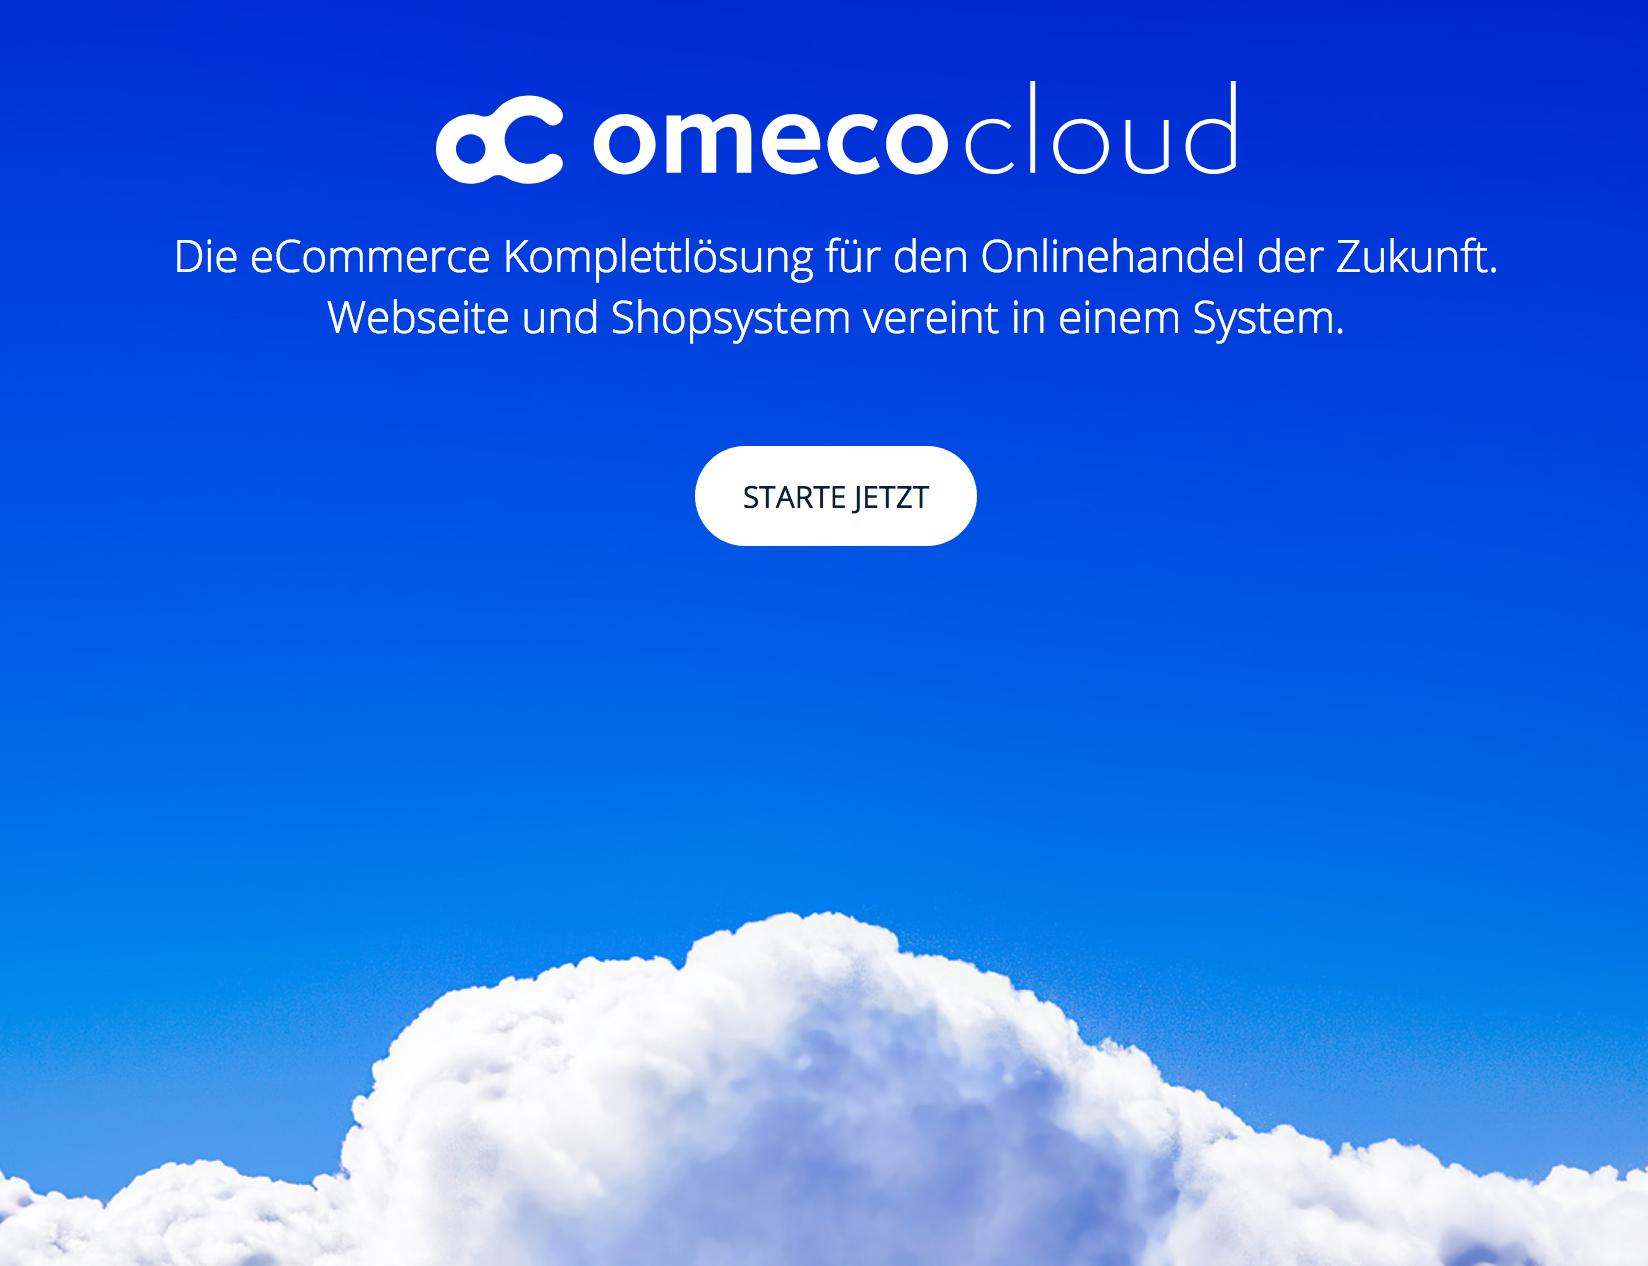 OmecoCloud: Shopsystem bereits ab 19 € mtl.